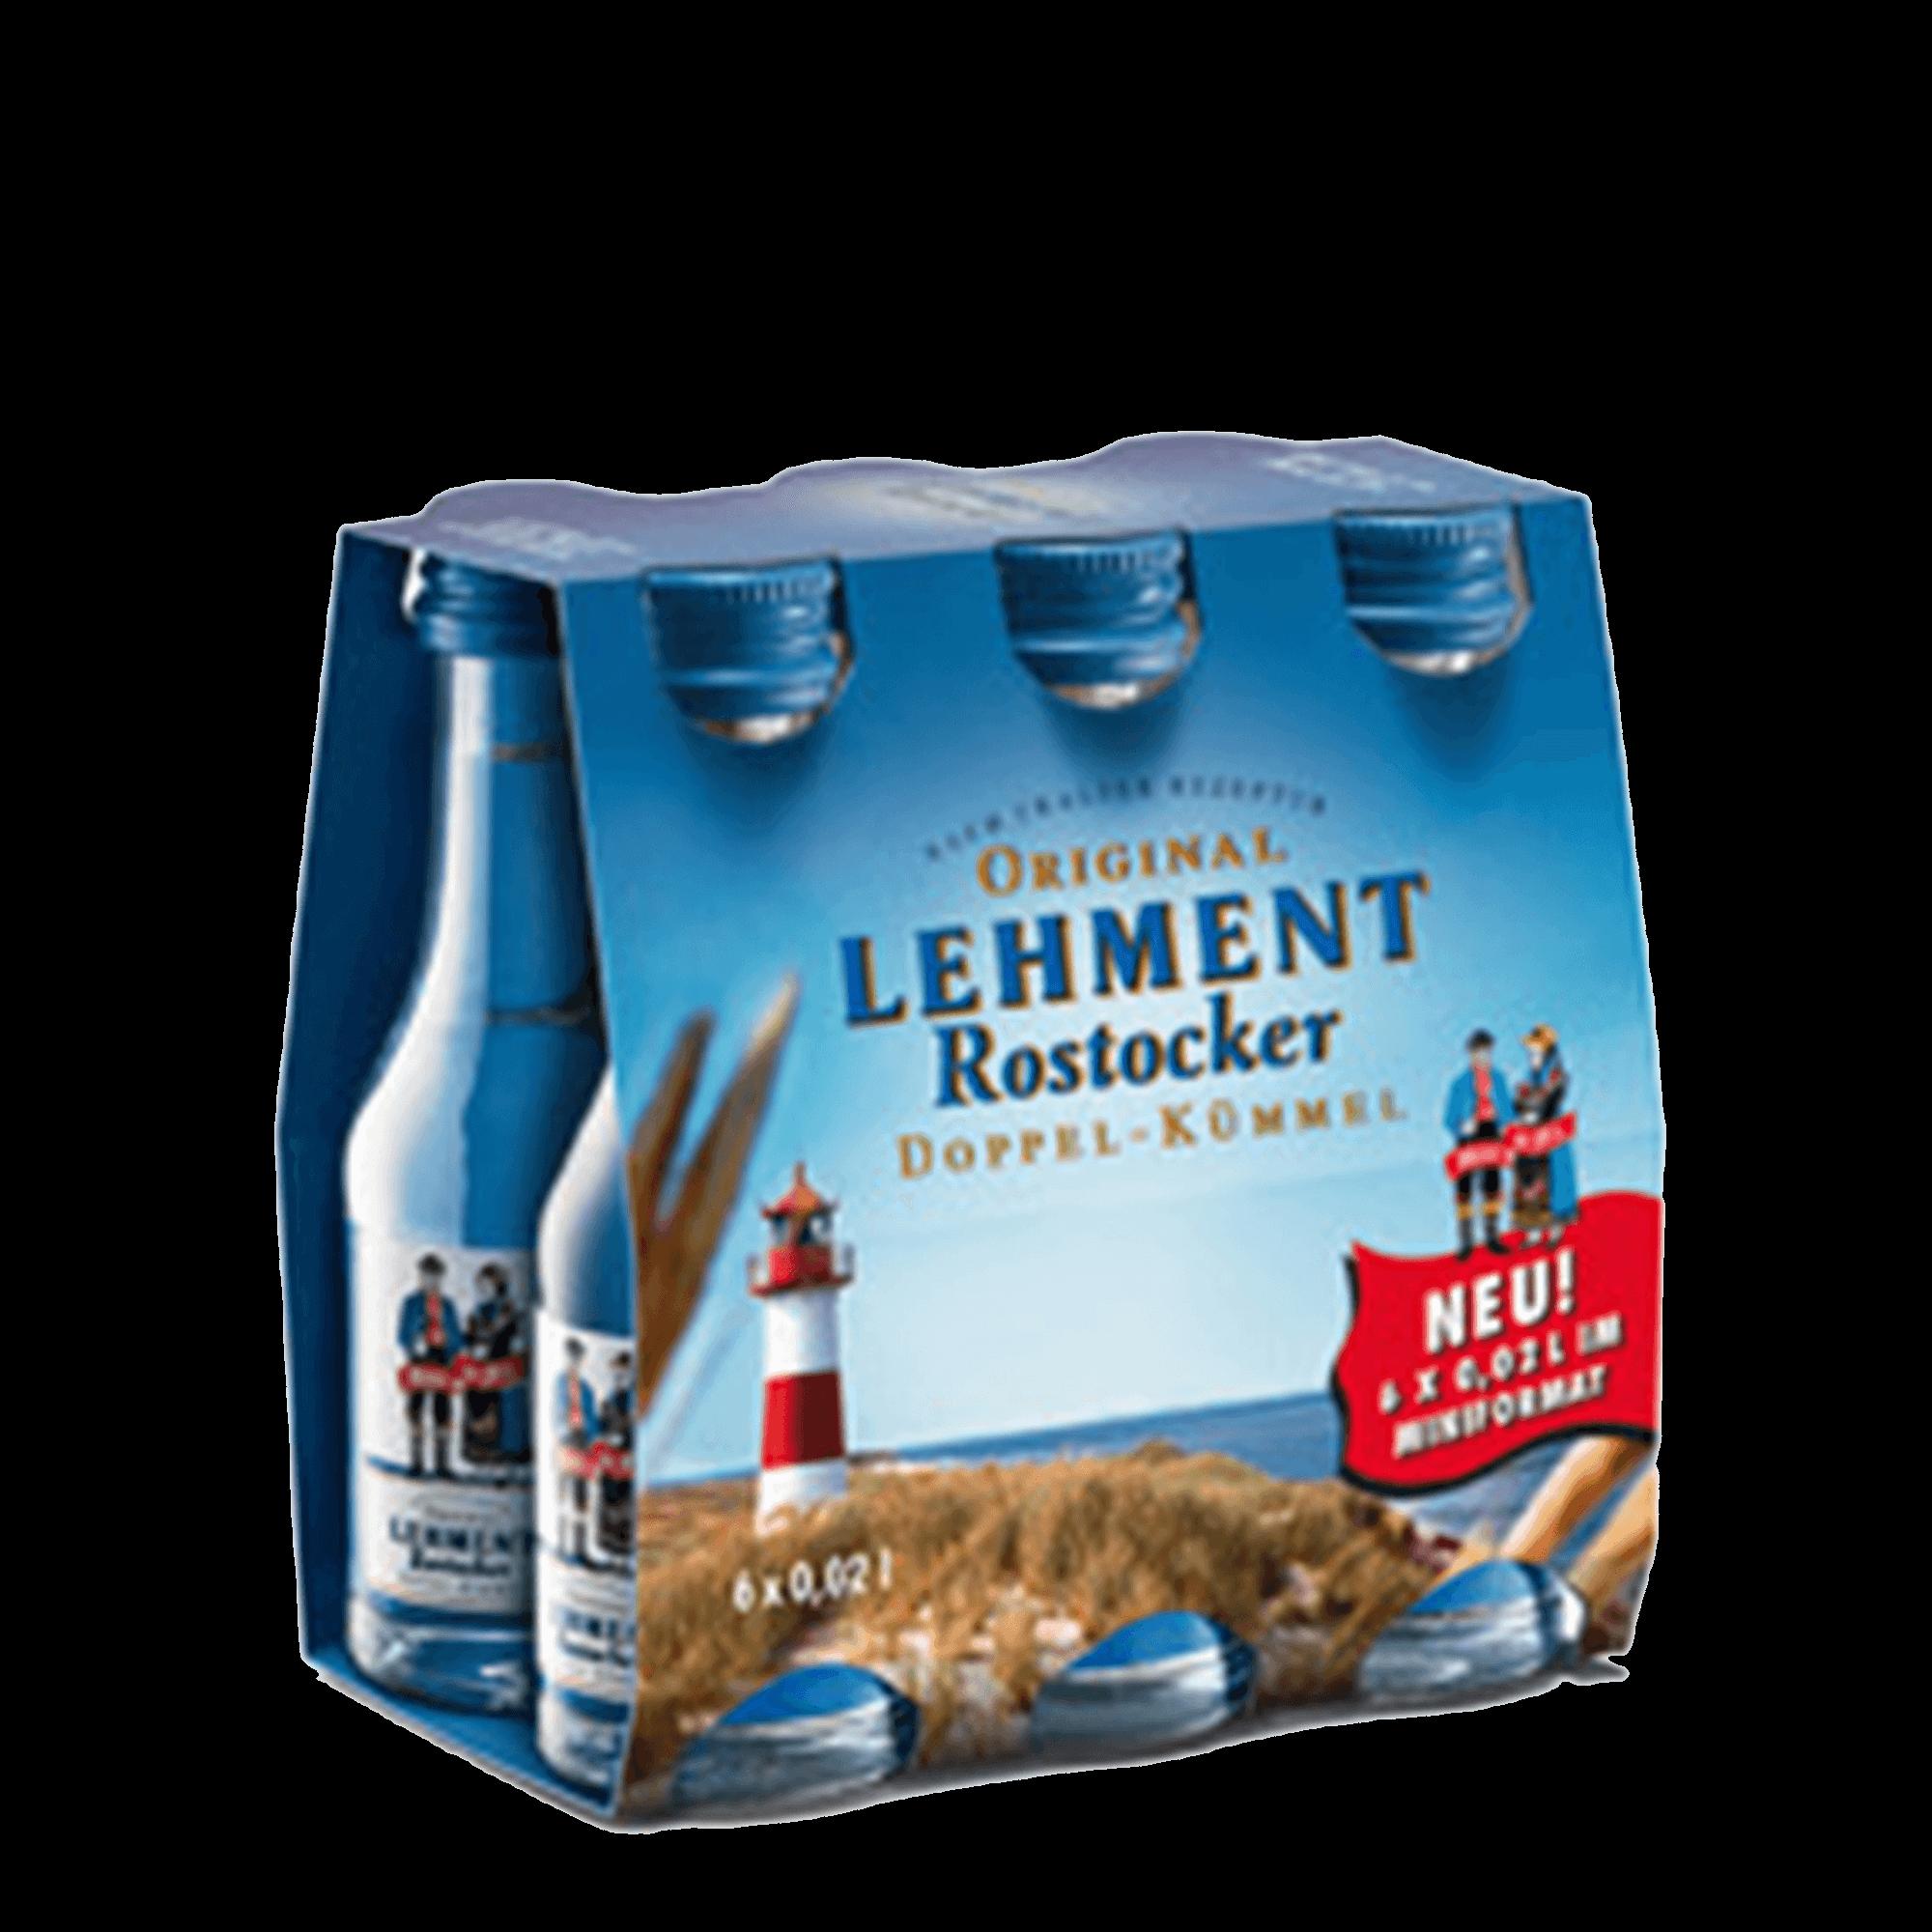 Original Lehment Rostocker Doppel-Kümmel